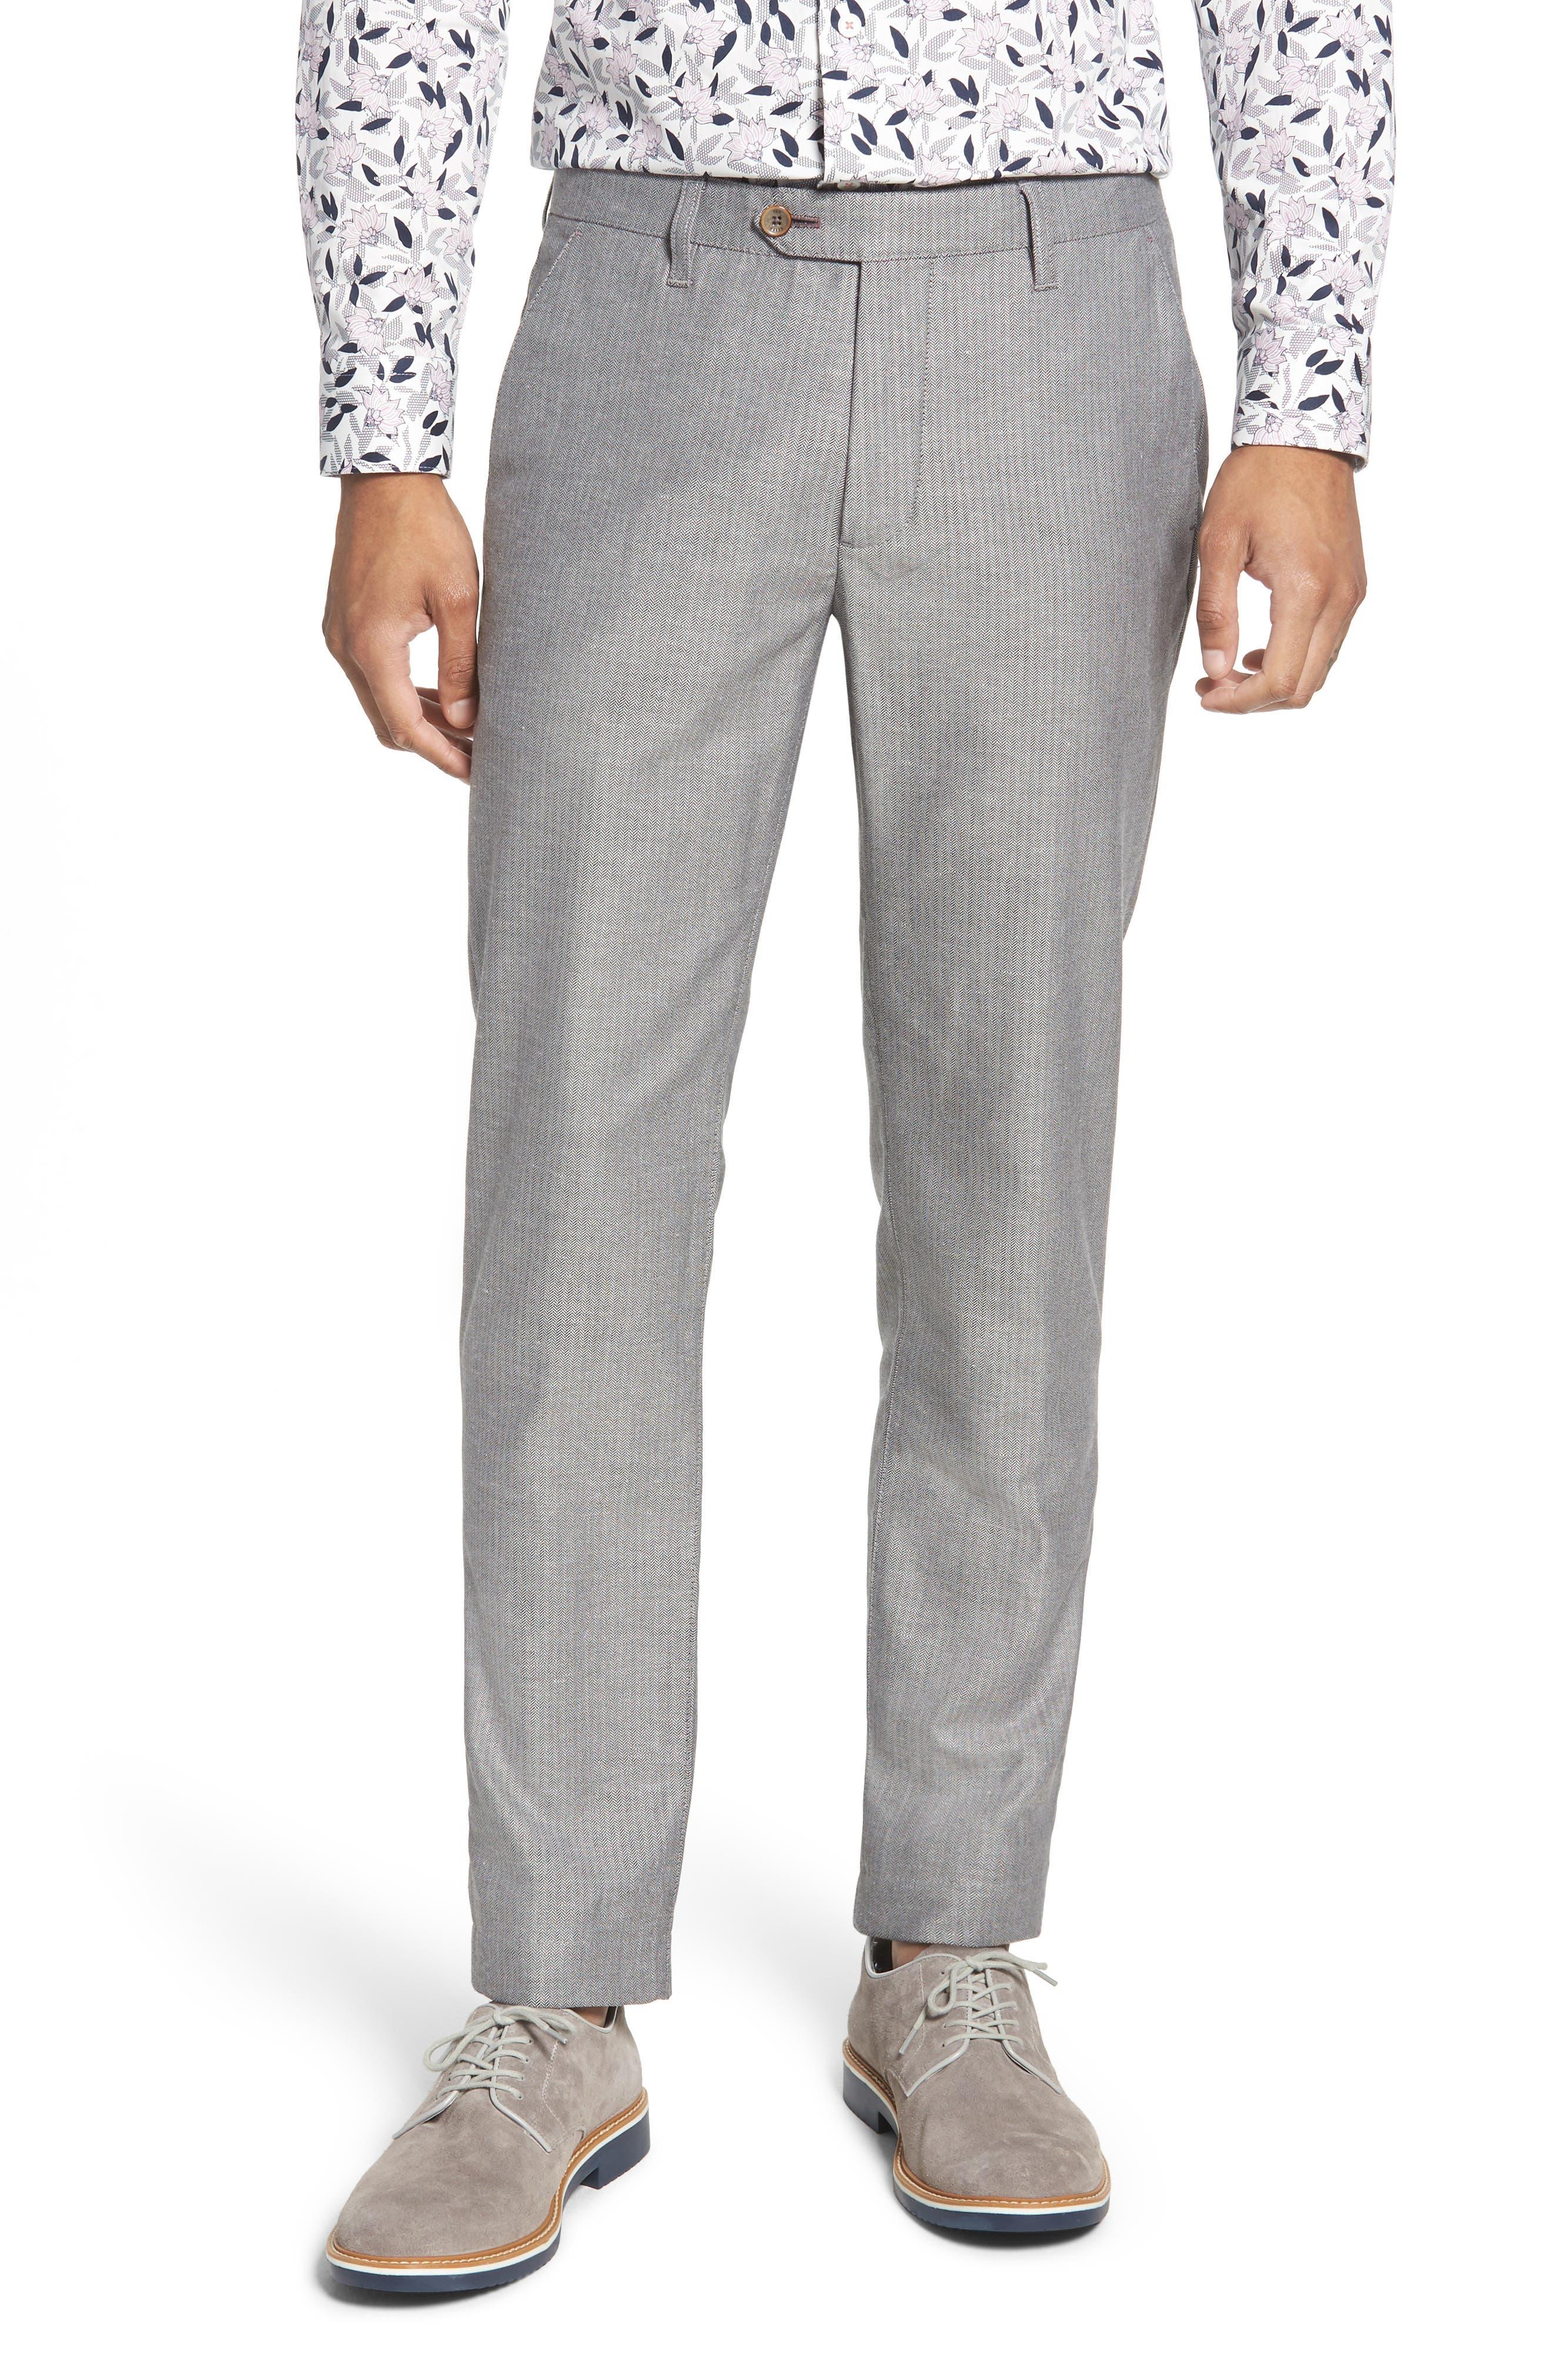 TED BAKER LONDON Cazzman Flat Front Stretch Pants, Main, color, 010